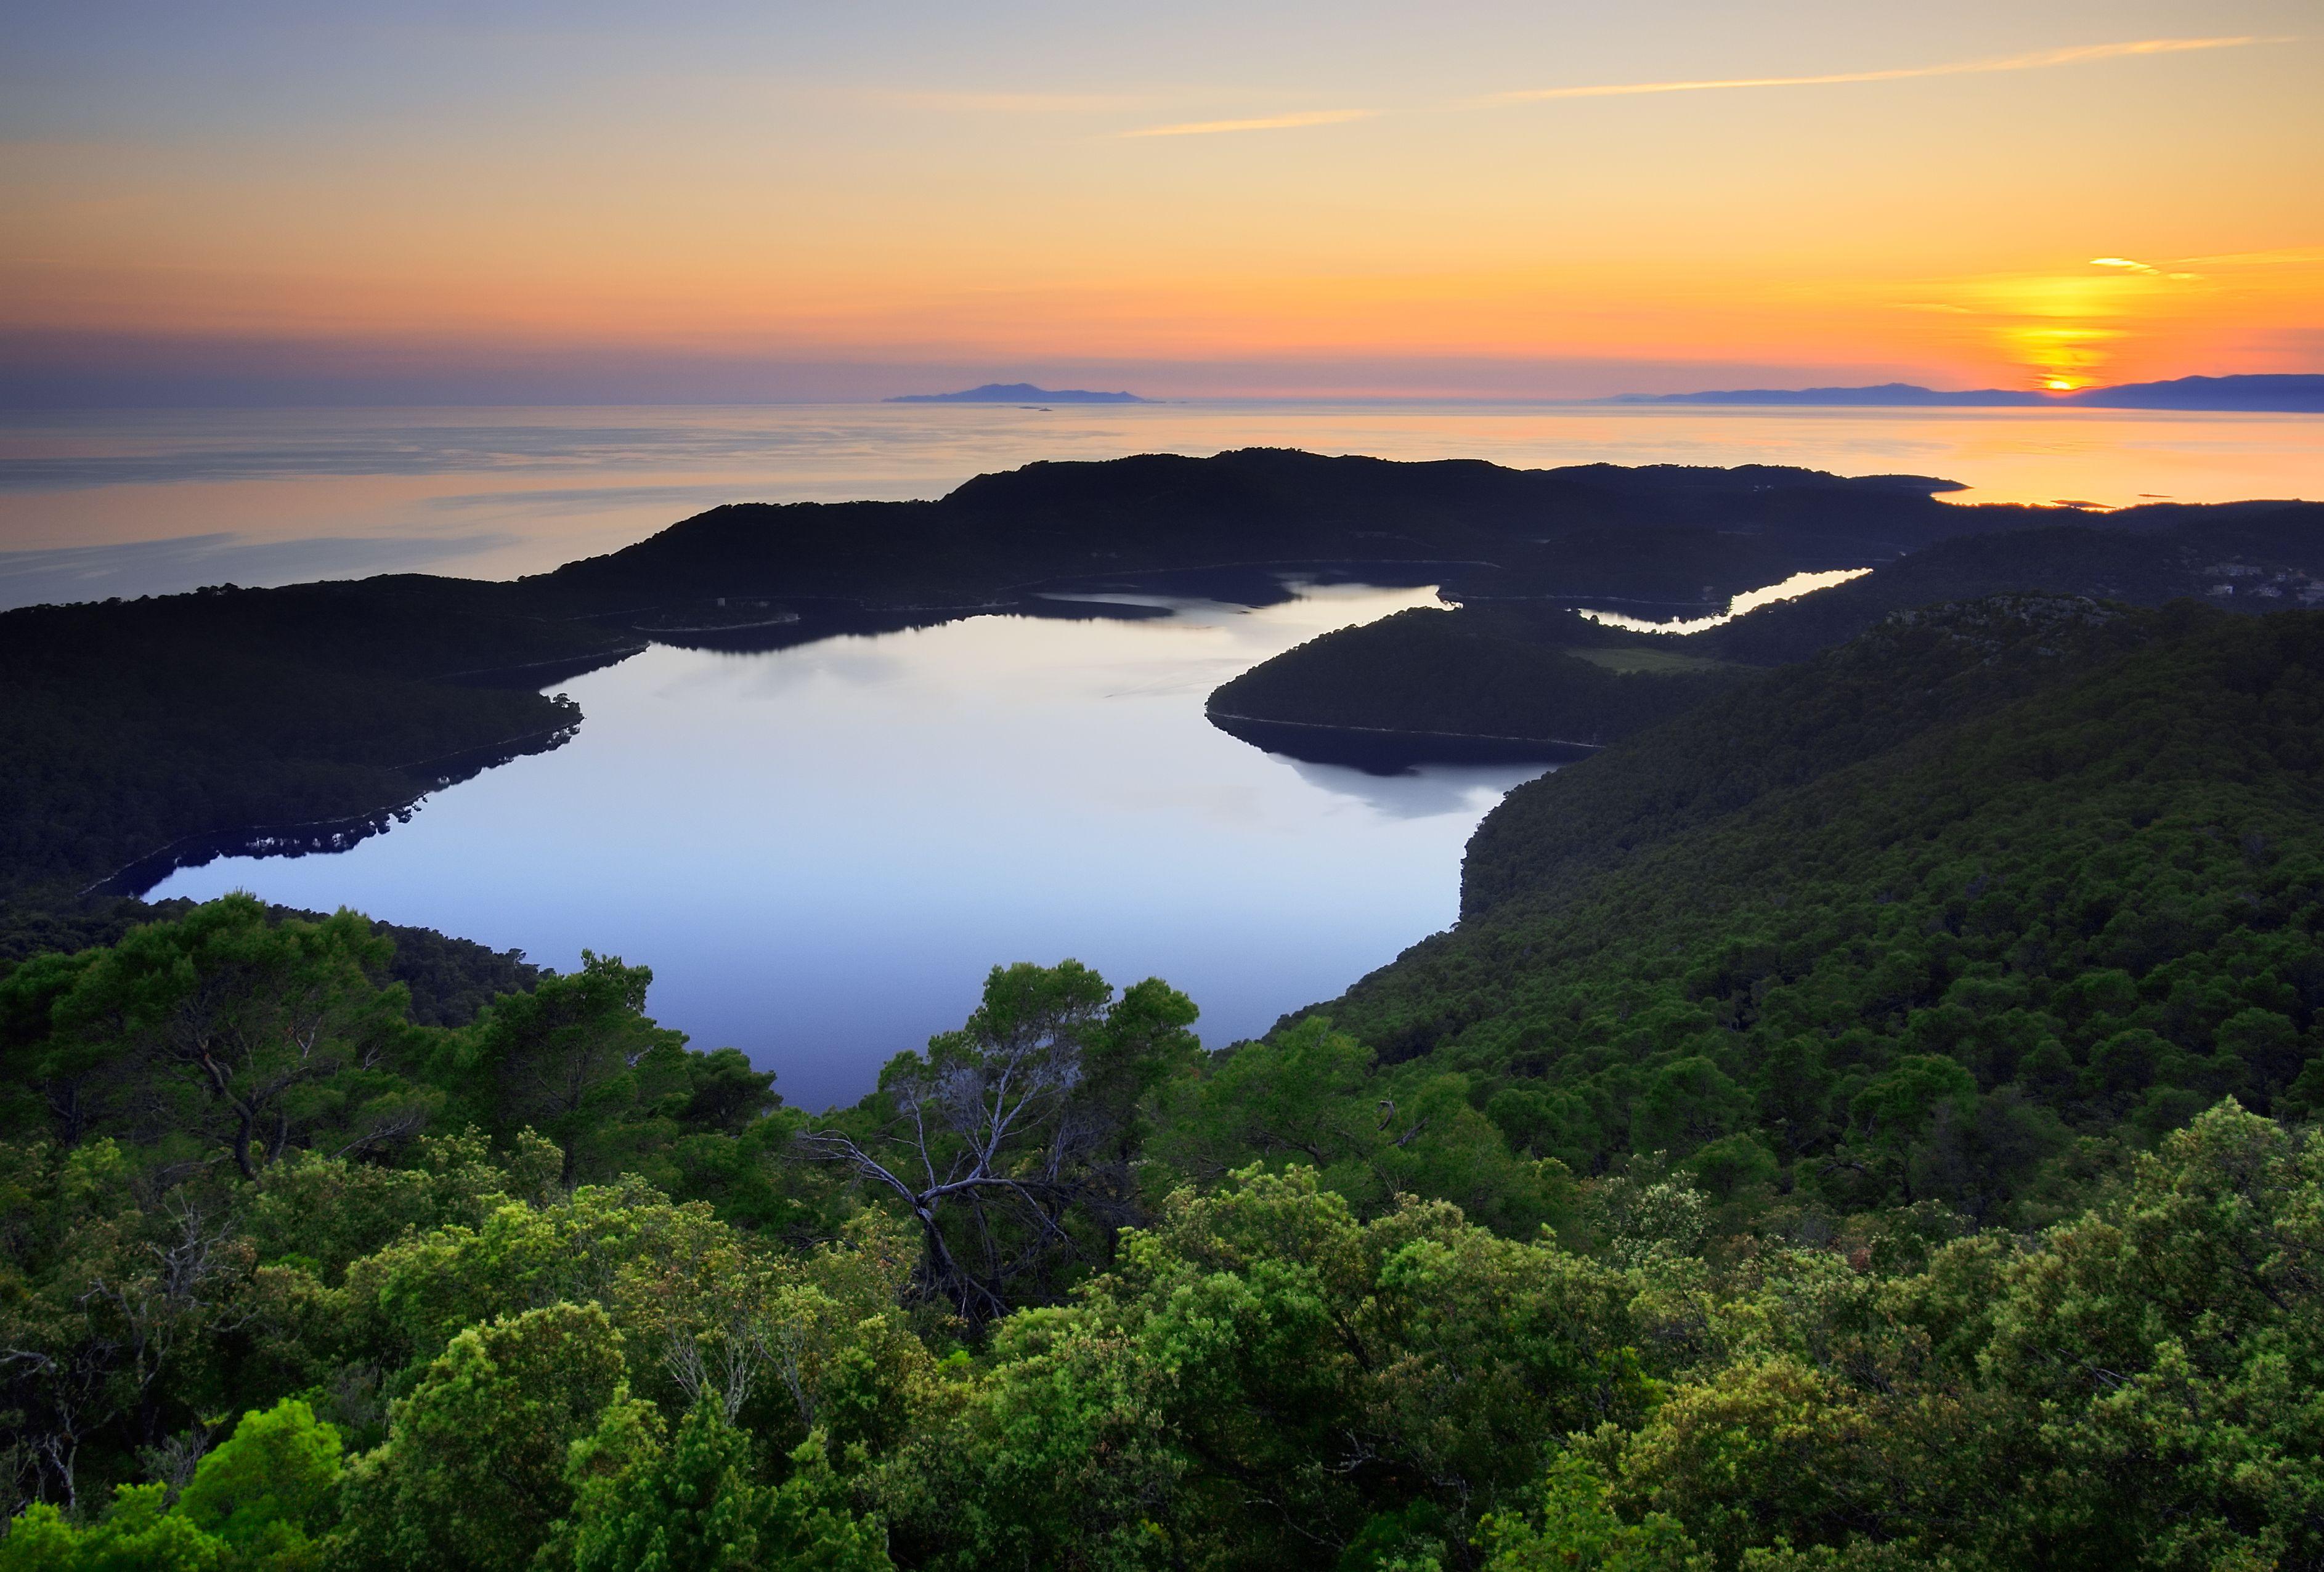 Sunset Over The Lakes On The Island Of Mljet Croatia Croatia National Park Croatian Islands Croatia